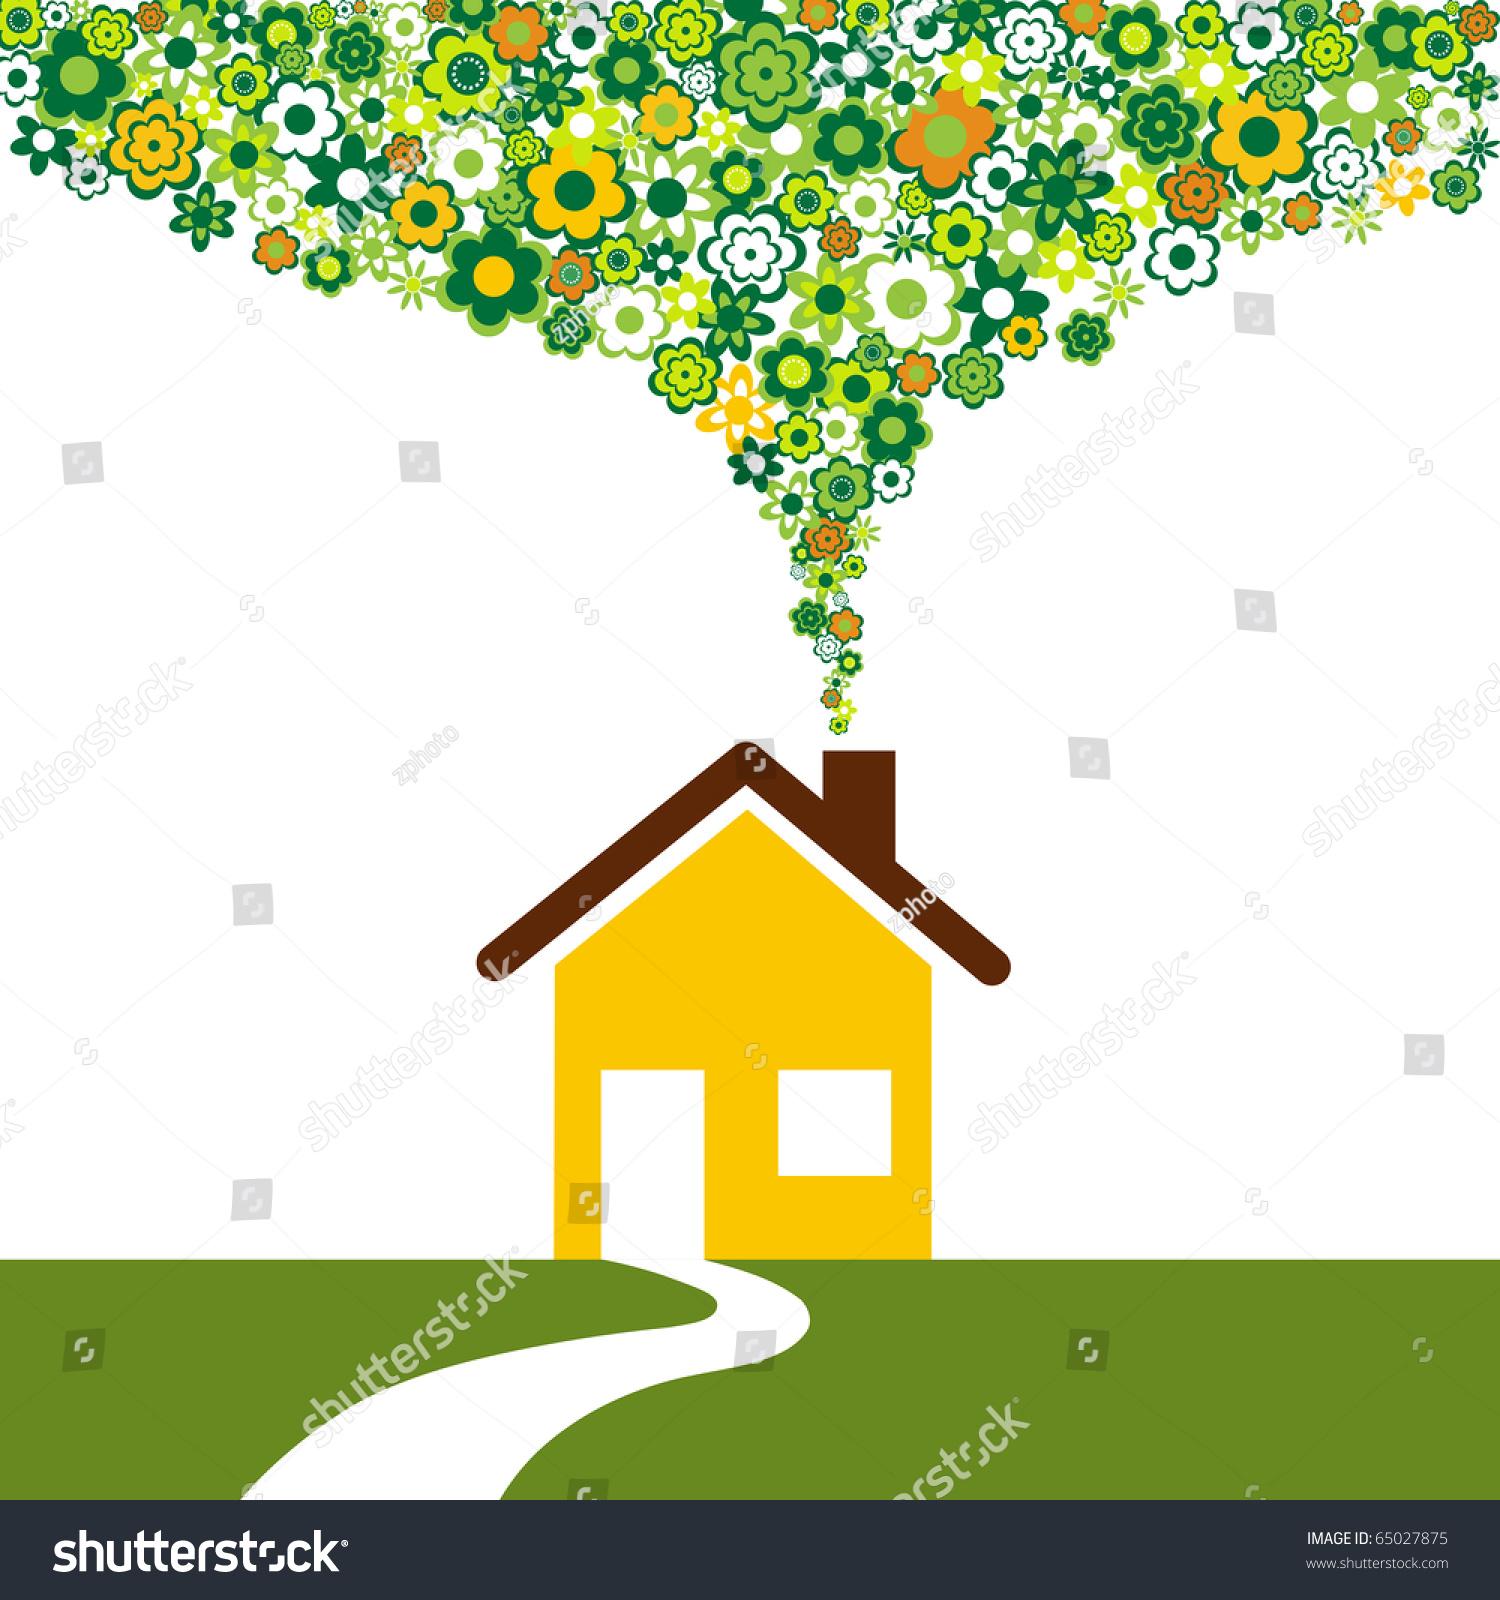 Environmentally Friendly House Flowers Instead Smoke Stock Vector